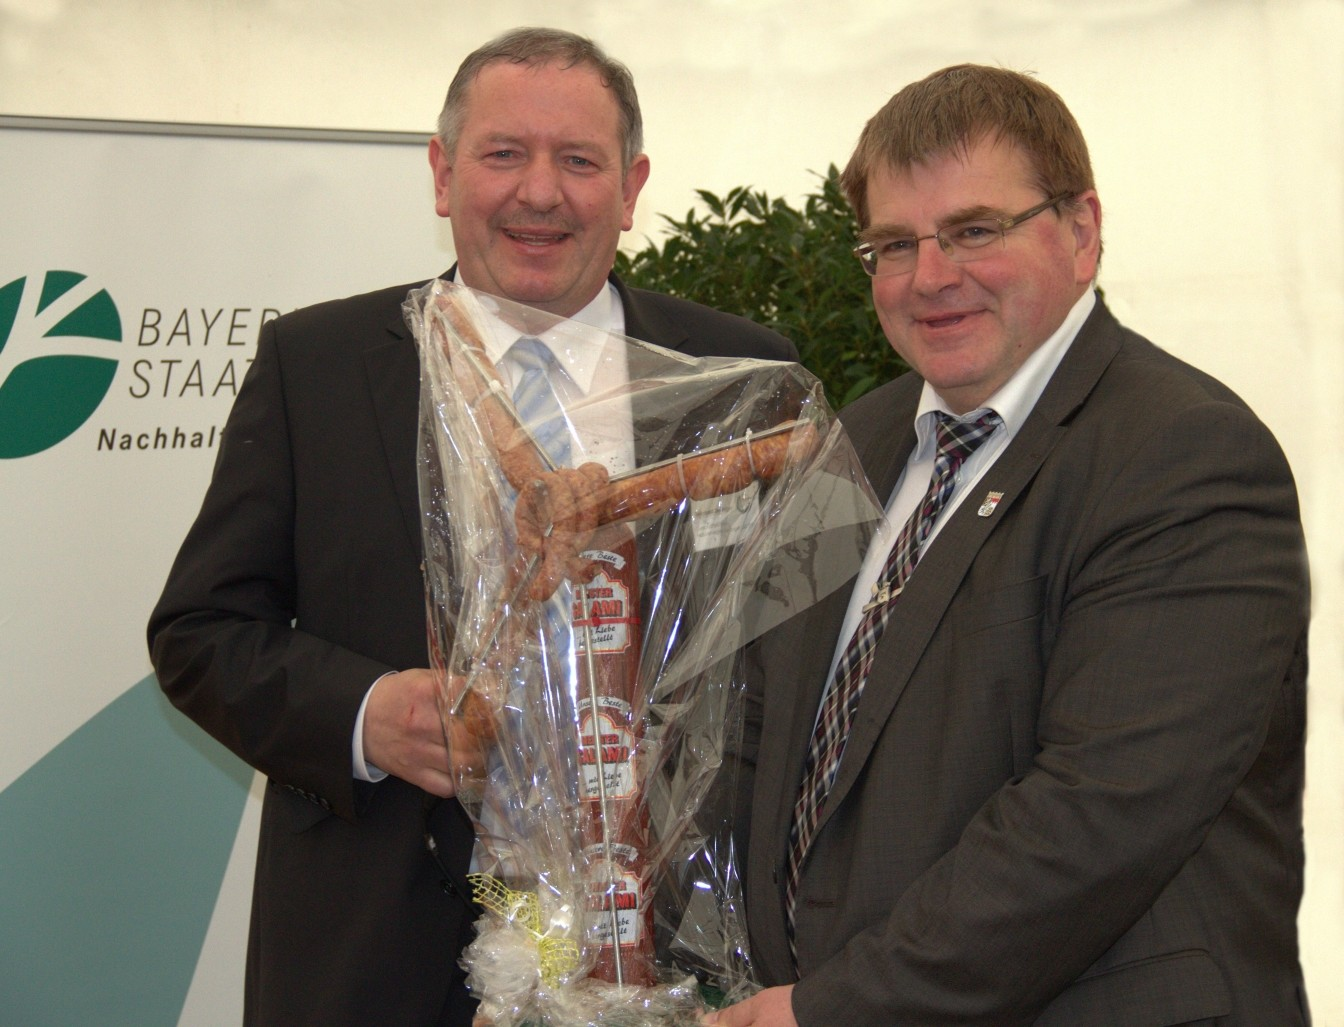 Reinhold Zeilinger, Harry Scheuenstuhl, MdL